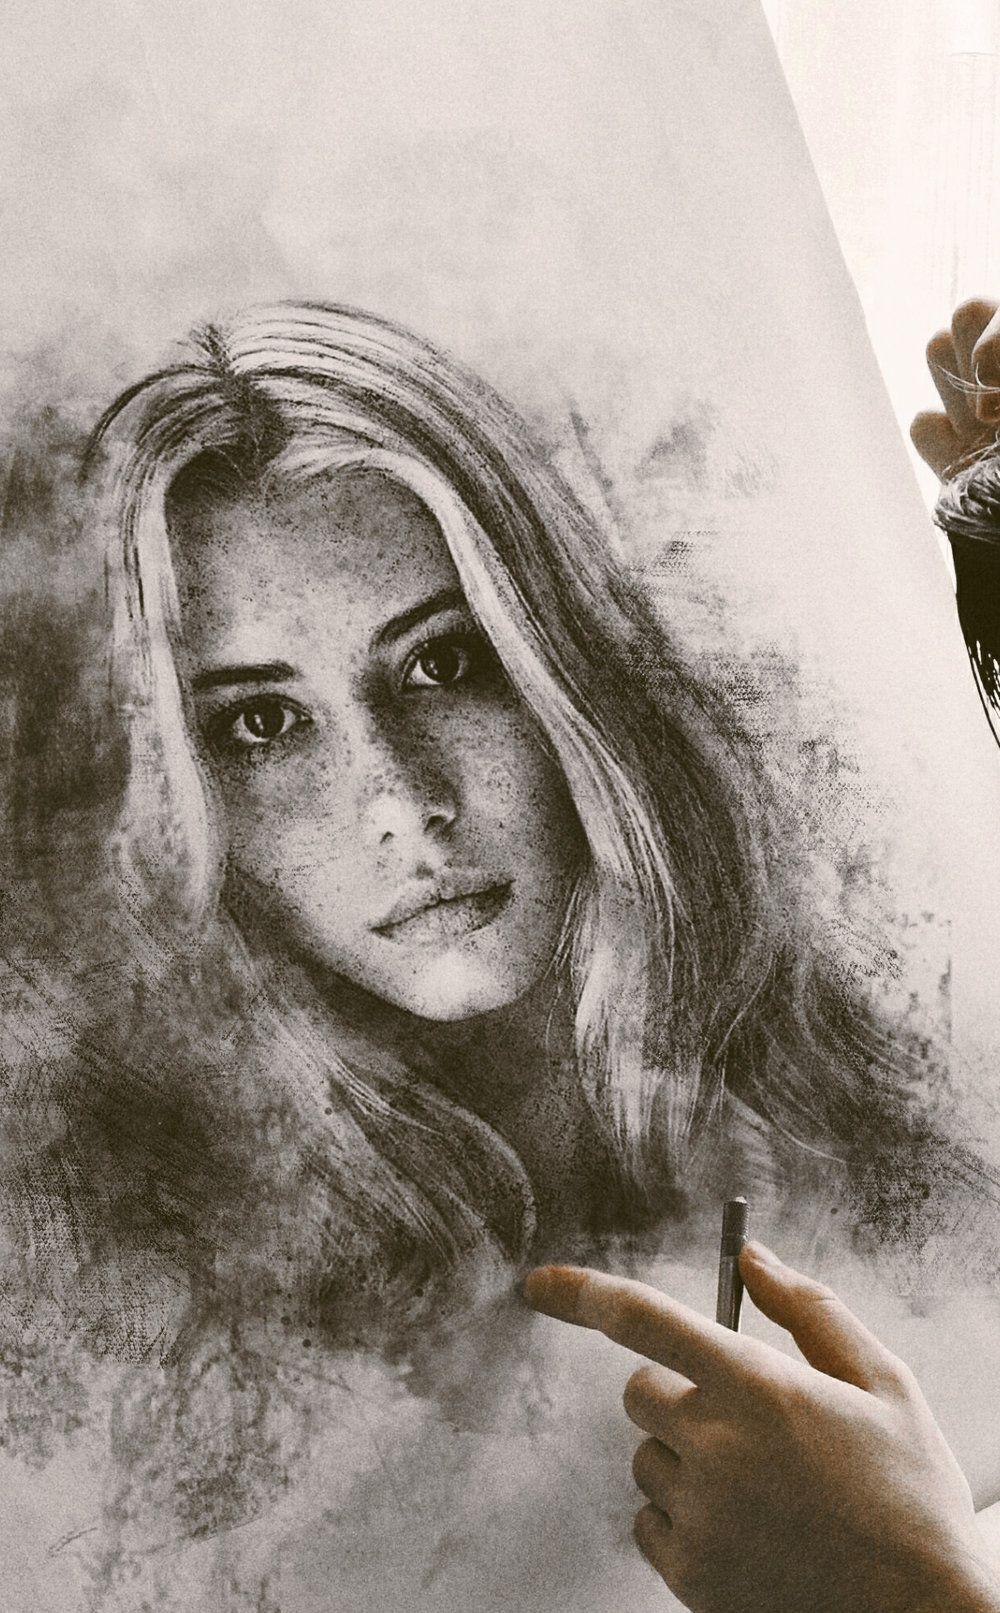 Astounding charcoal drawings by John Fenerov. Autumn Salon Interview.